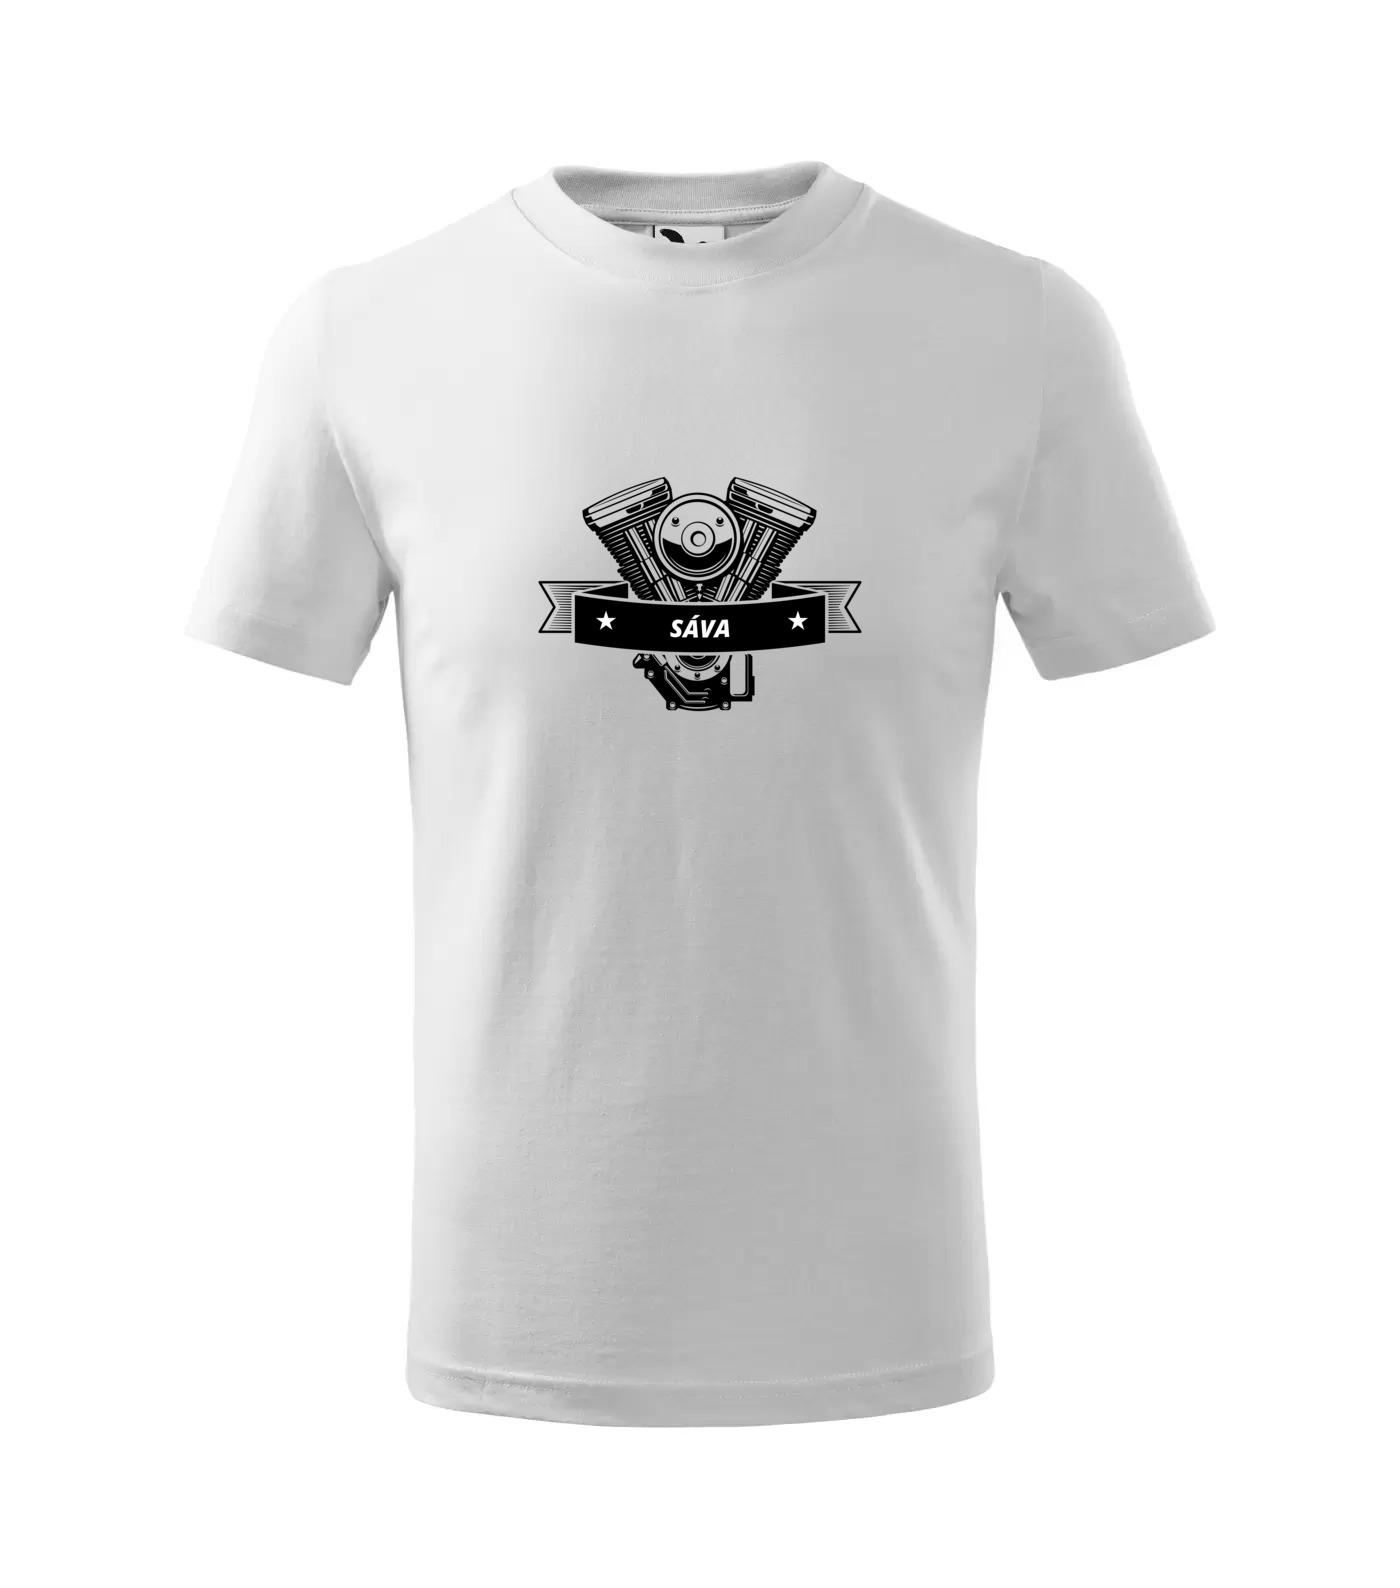 Tričko Motorkář Sáva